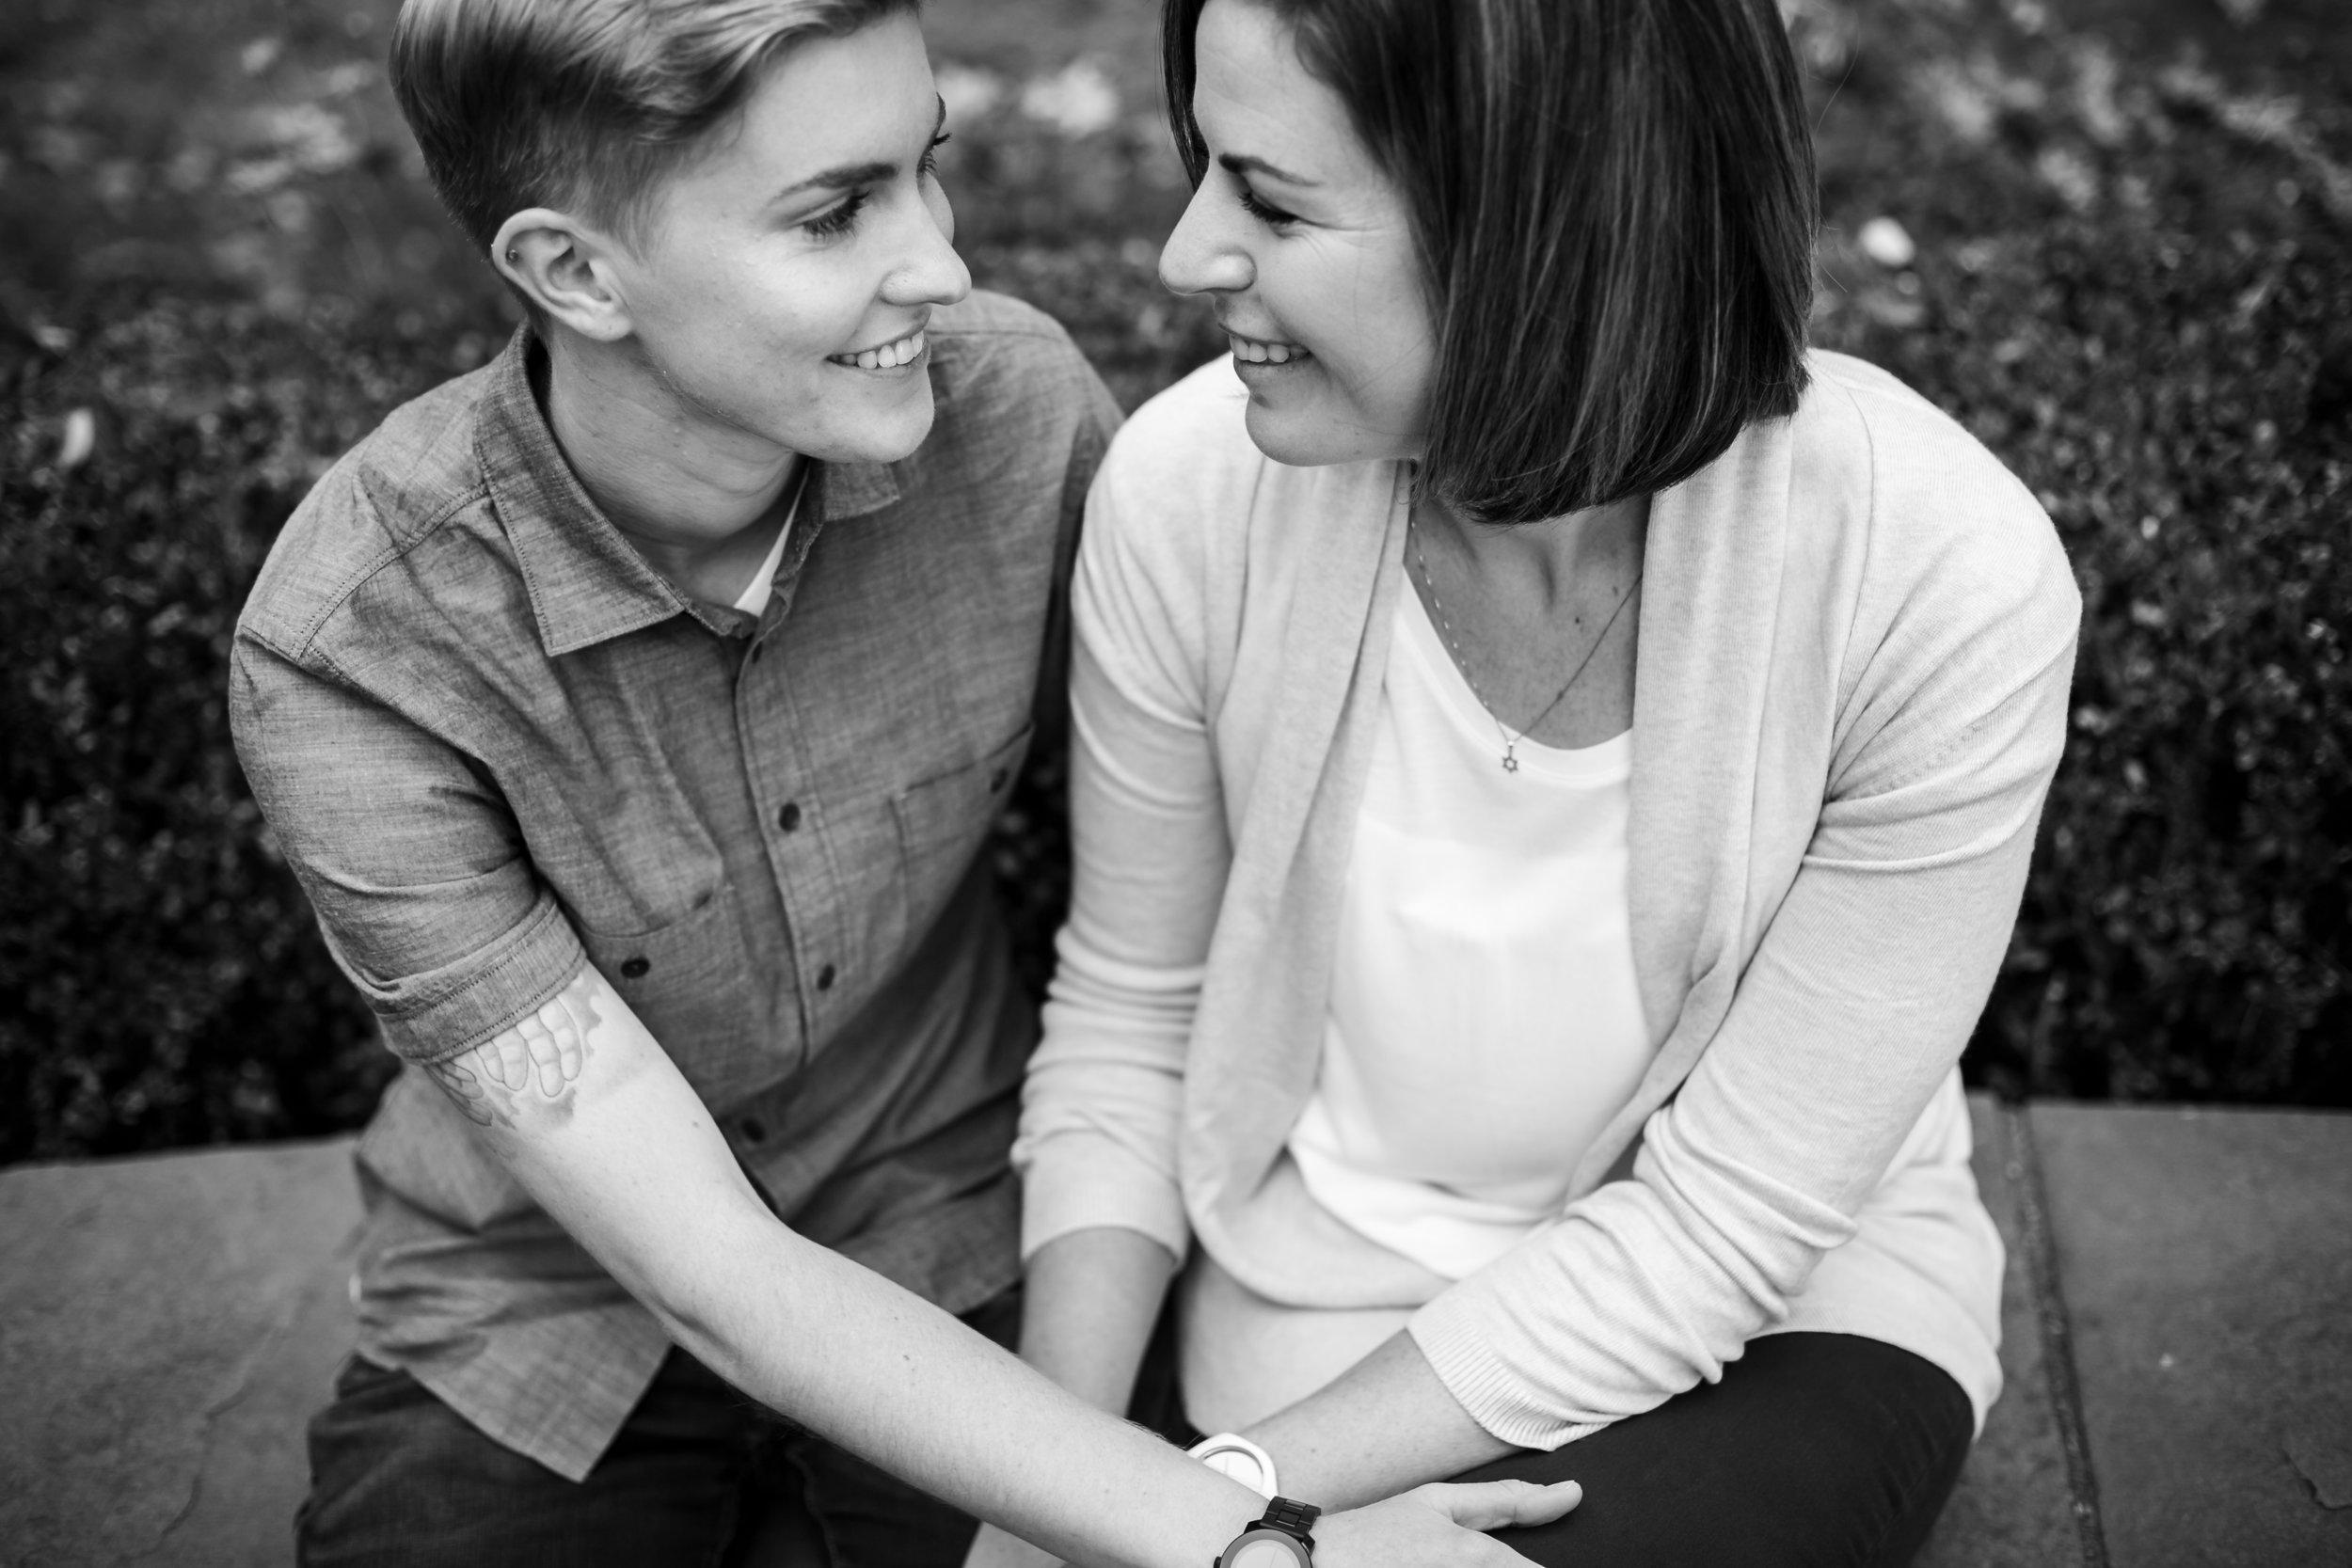 Philadelphia Queer Engagement Session by Lesbian Photographer Amanda Swiger 7